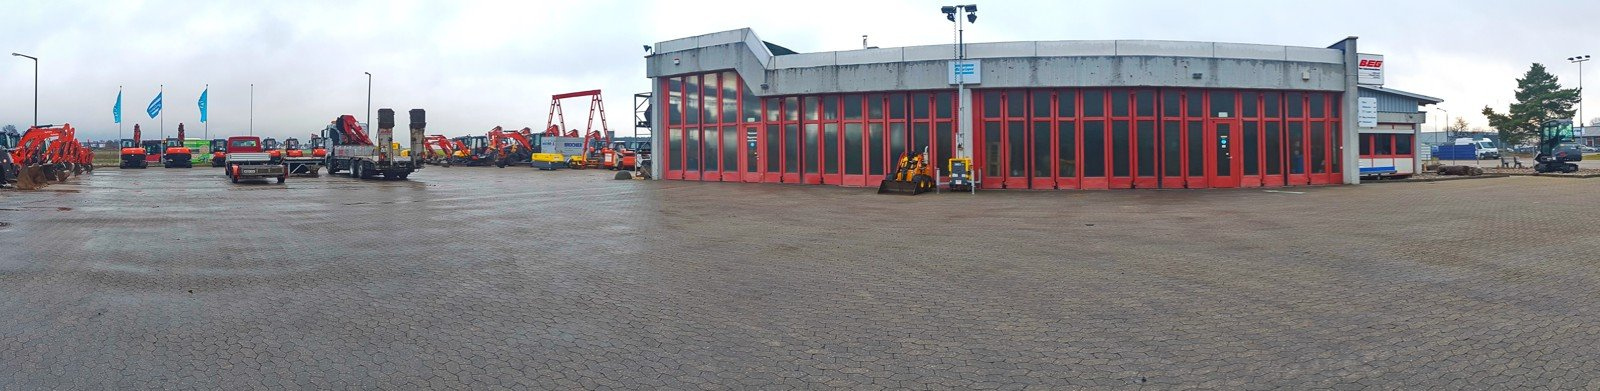 BEG Office Marburgerstr Nürnberg